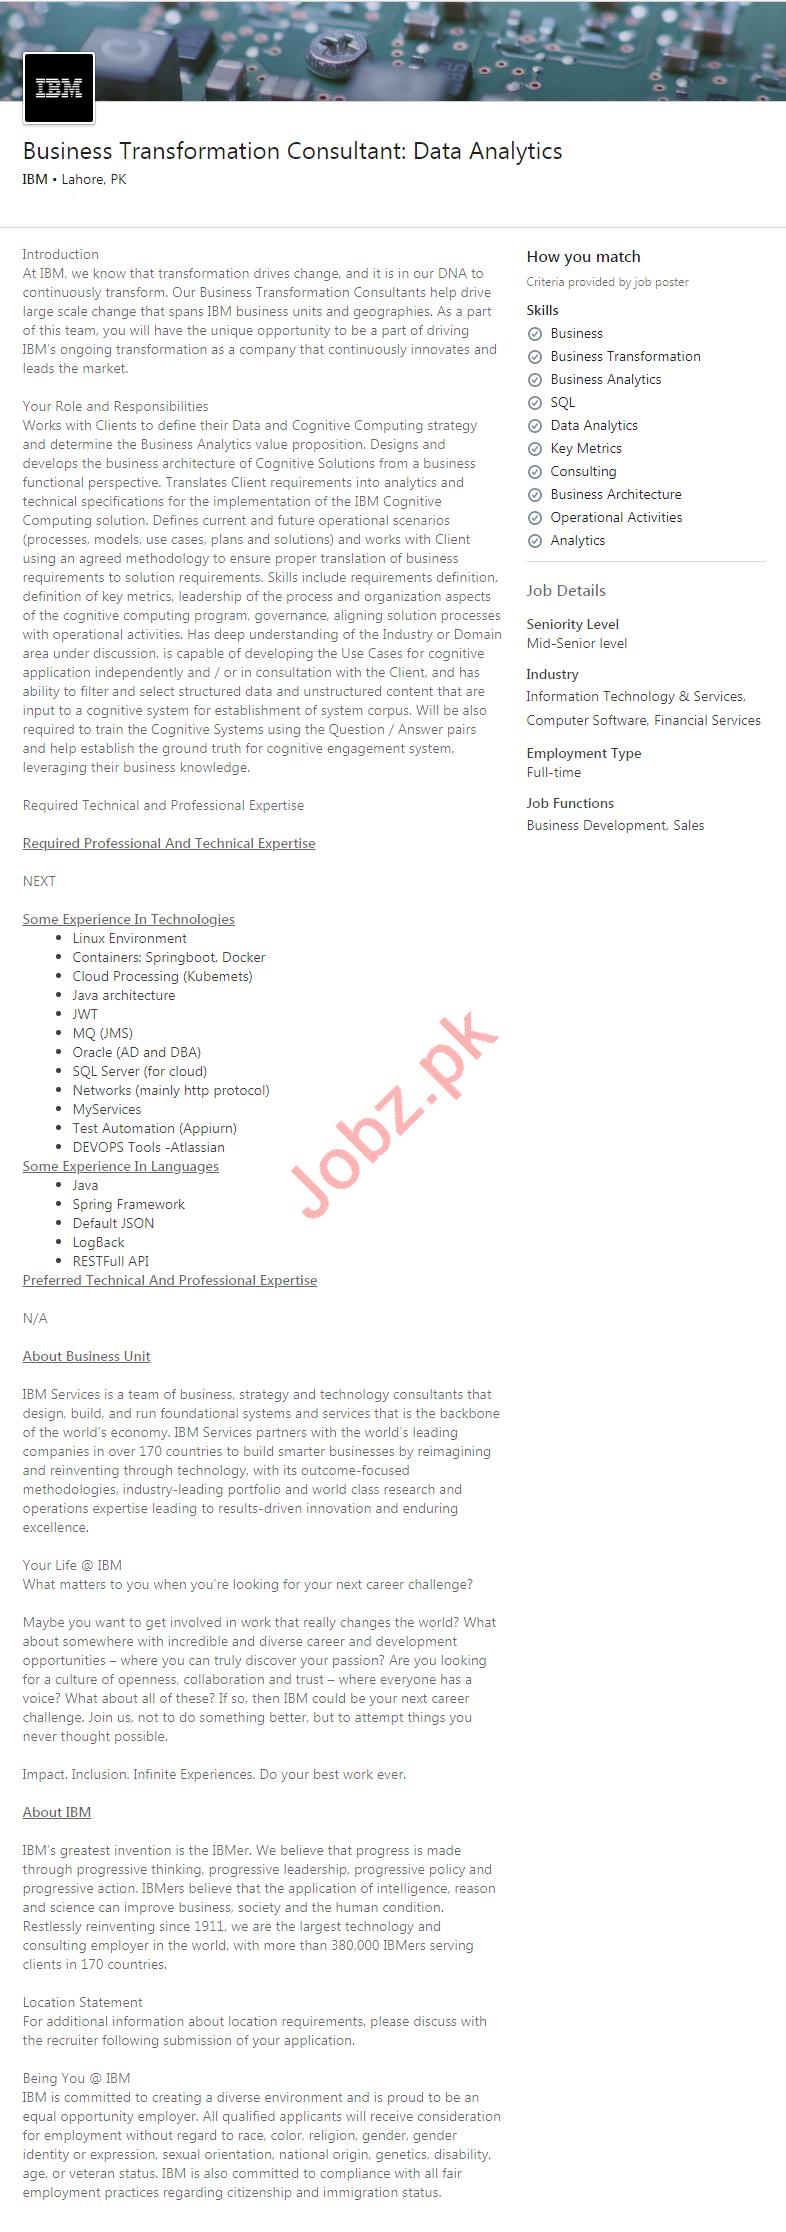 IBM Pakistan Jobs 2020 for Data Analytics